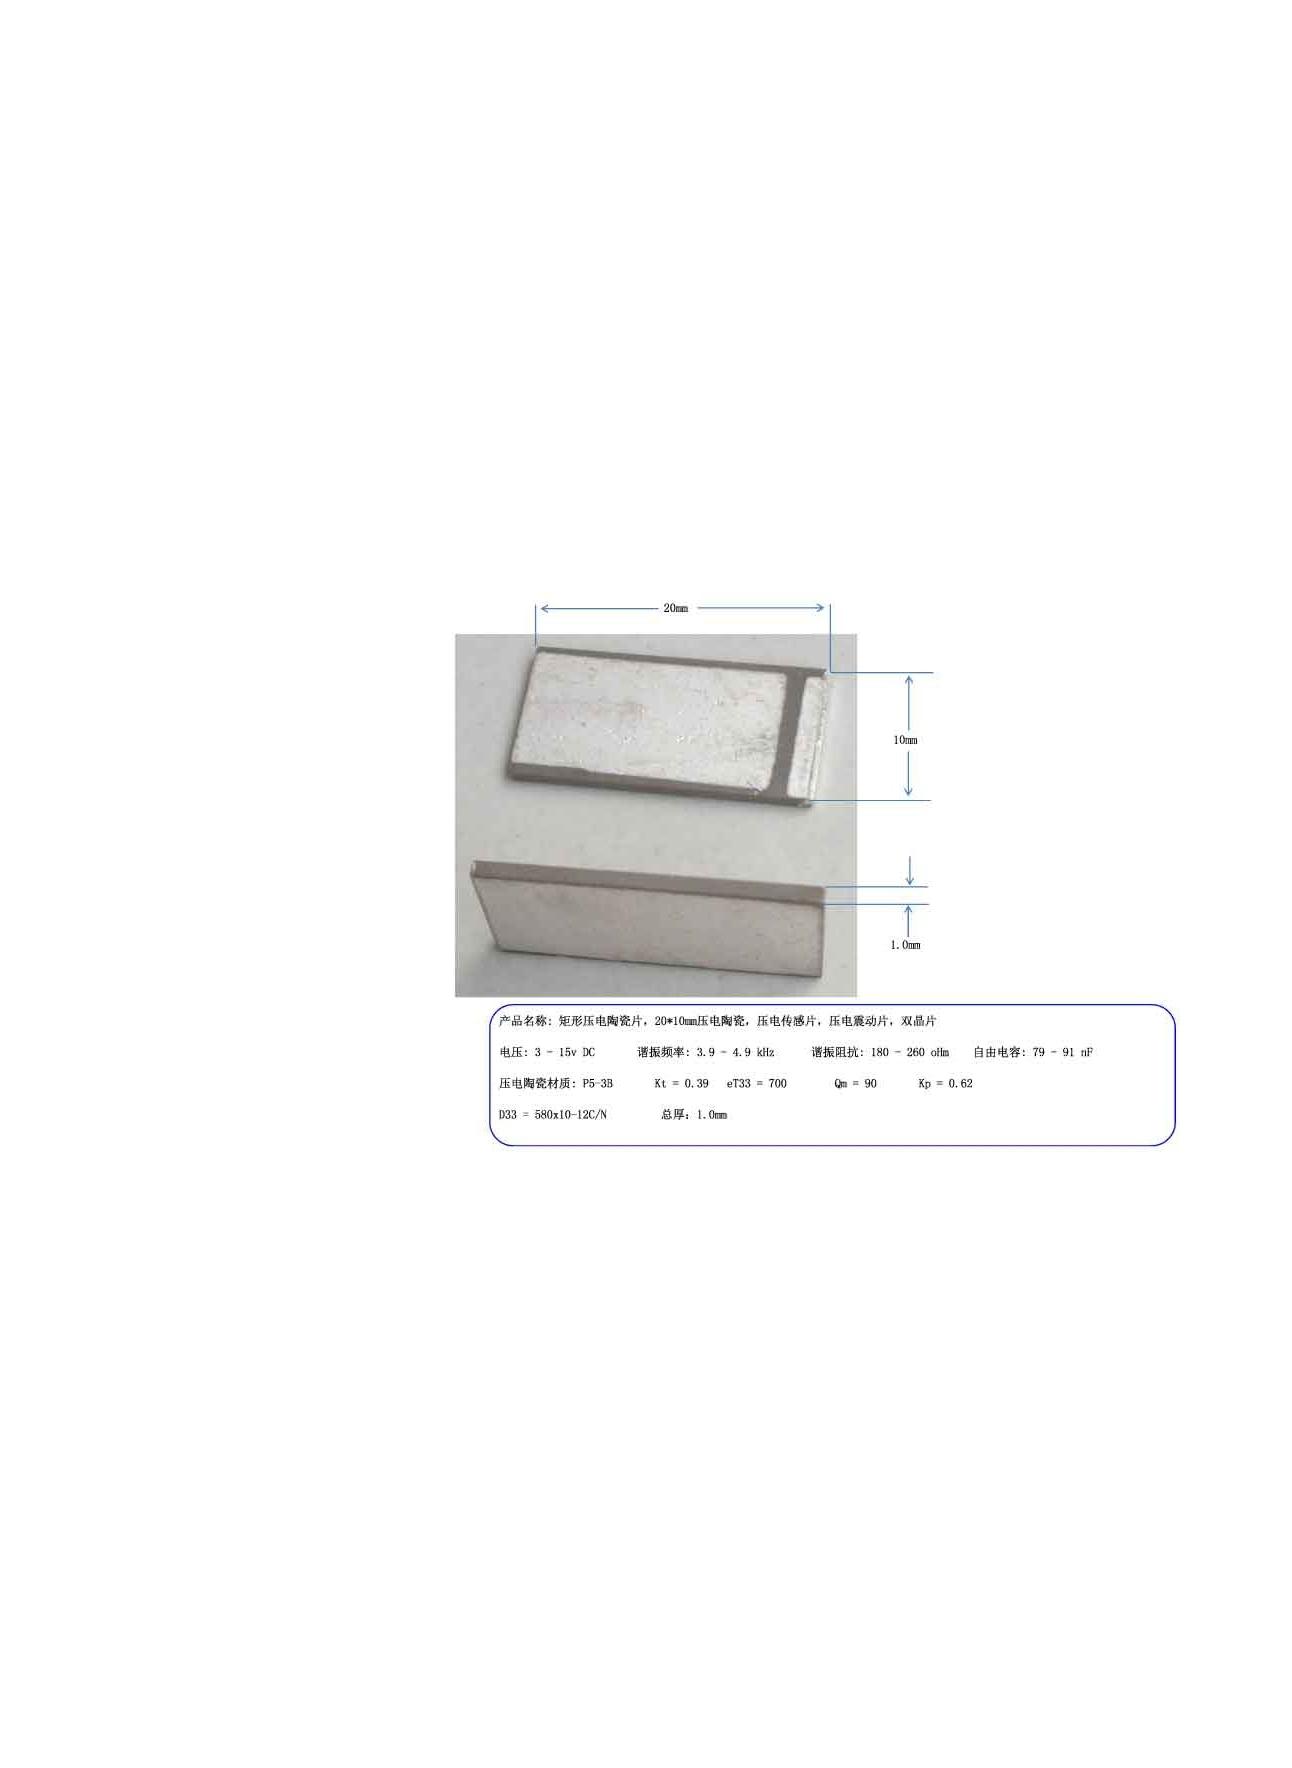 Rectangular piezoelectric ceramic, 20*10mm piezoelectric ceramics, piezoelectric film, piezoelectric vibration plate, bimorph vibration of orthotropic rectangular plate